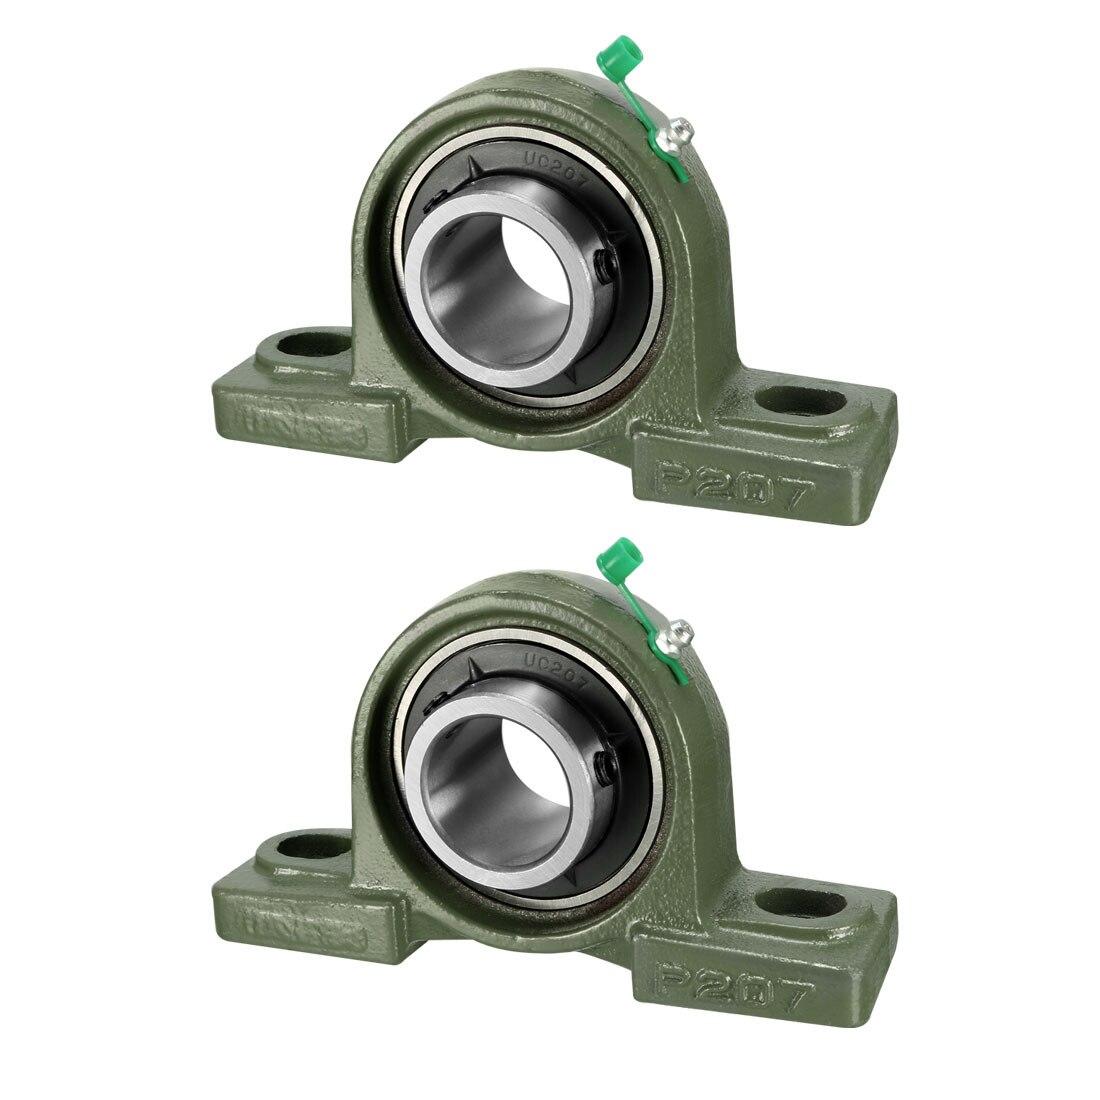 Uxcell 1pcs 2pcs UCP Pillow Block Bearing 12mm/15mm/17mm/20mm/25mm/30mm Bore Diameter Cast Iron/Chrome Steel Set Screw Lock